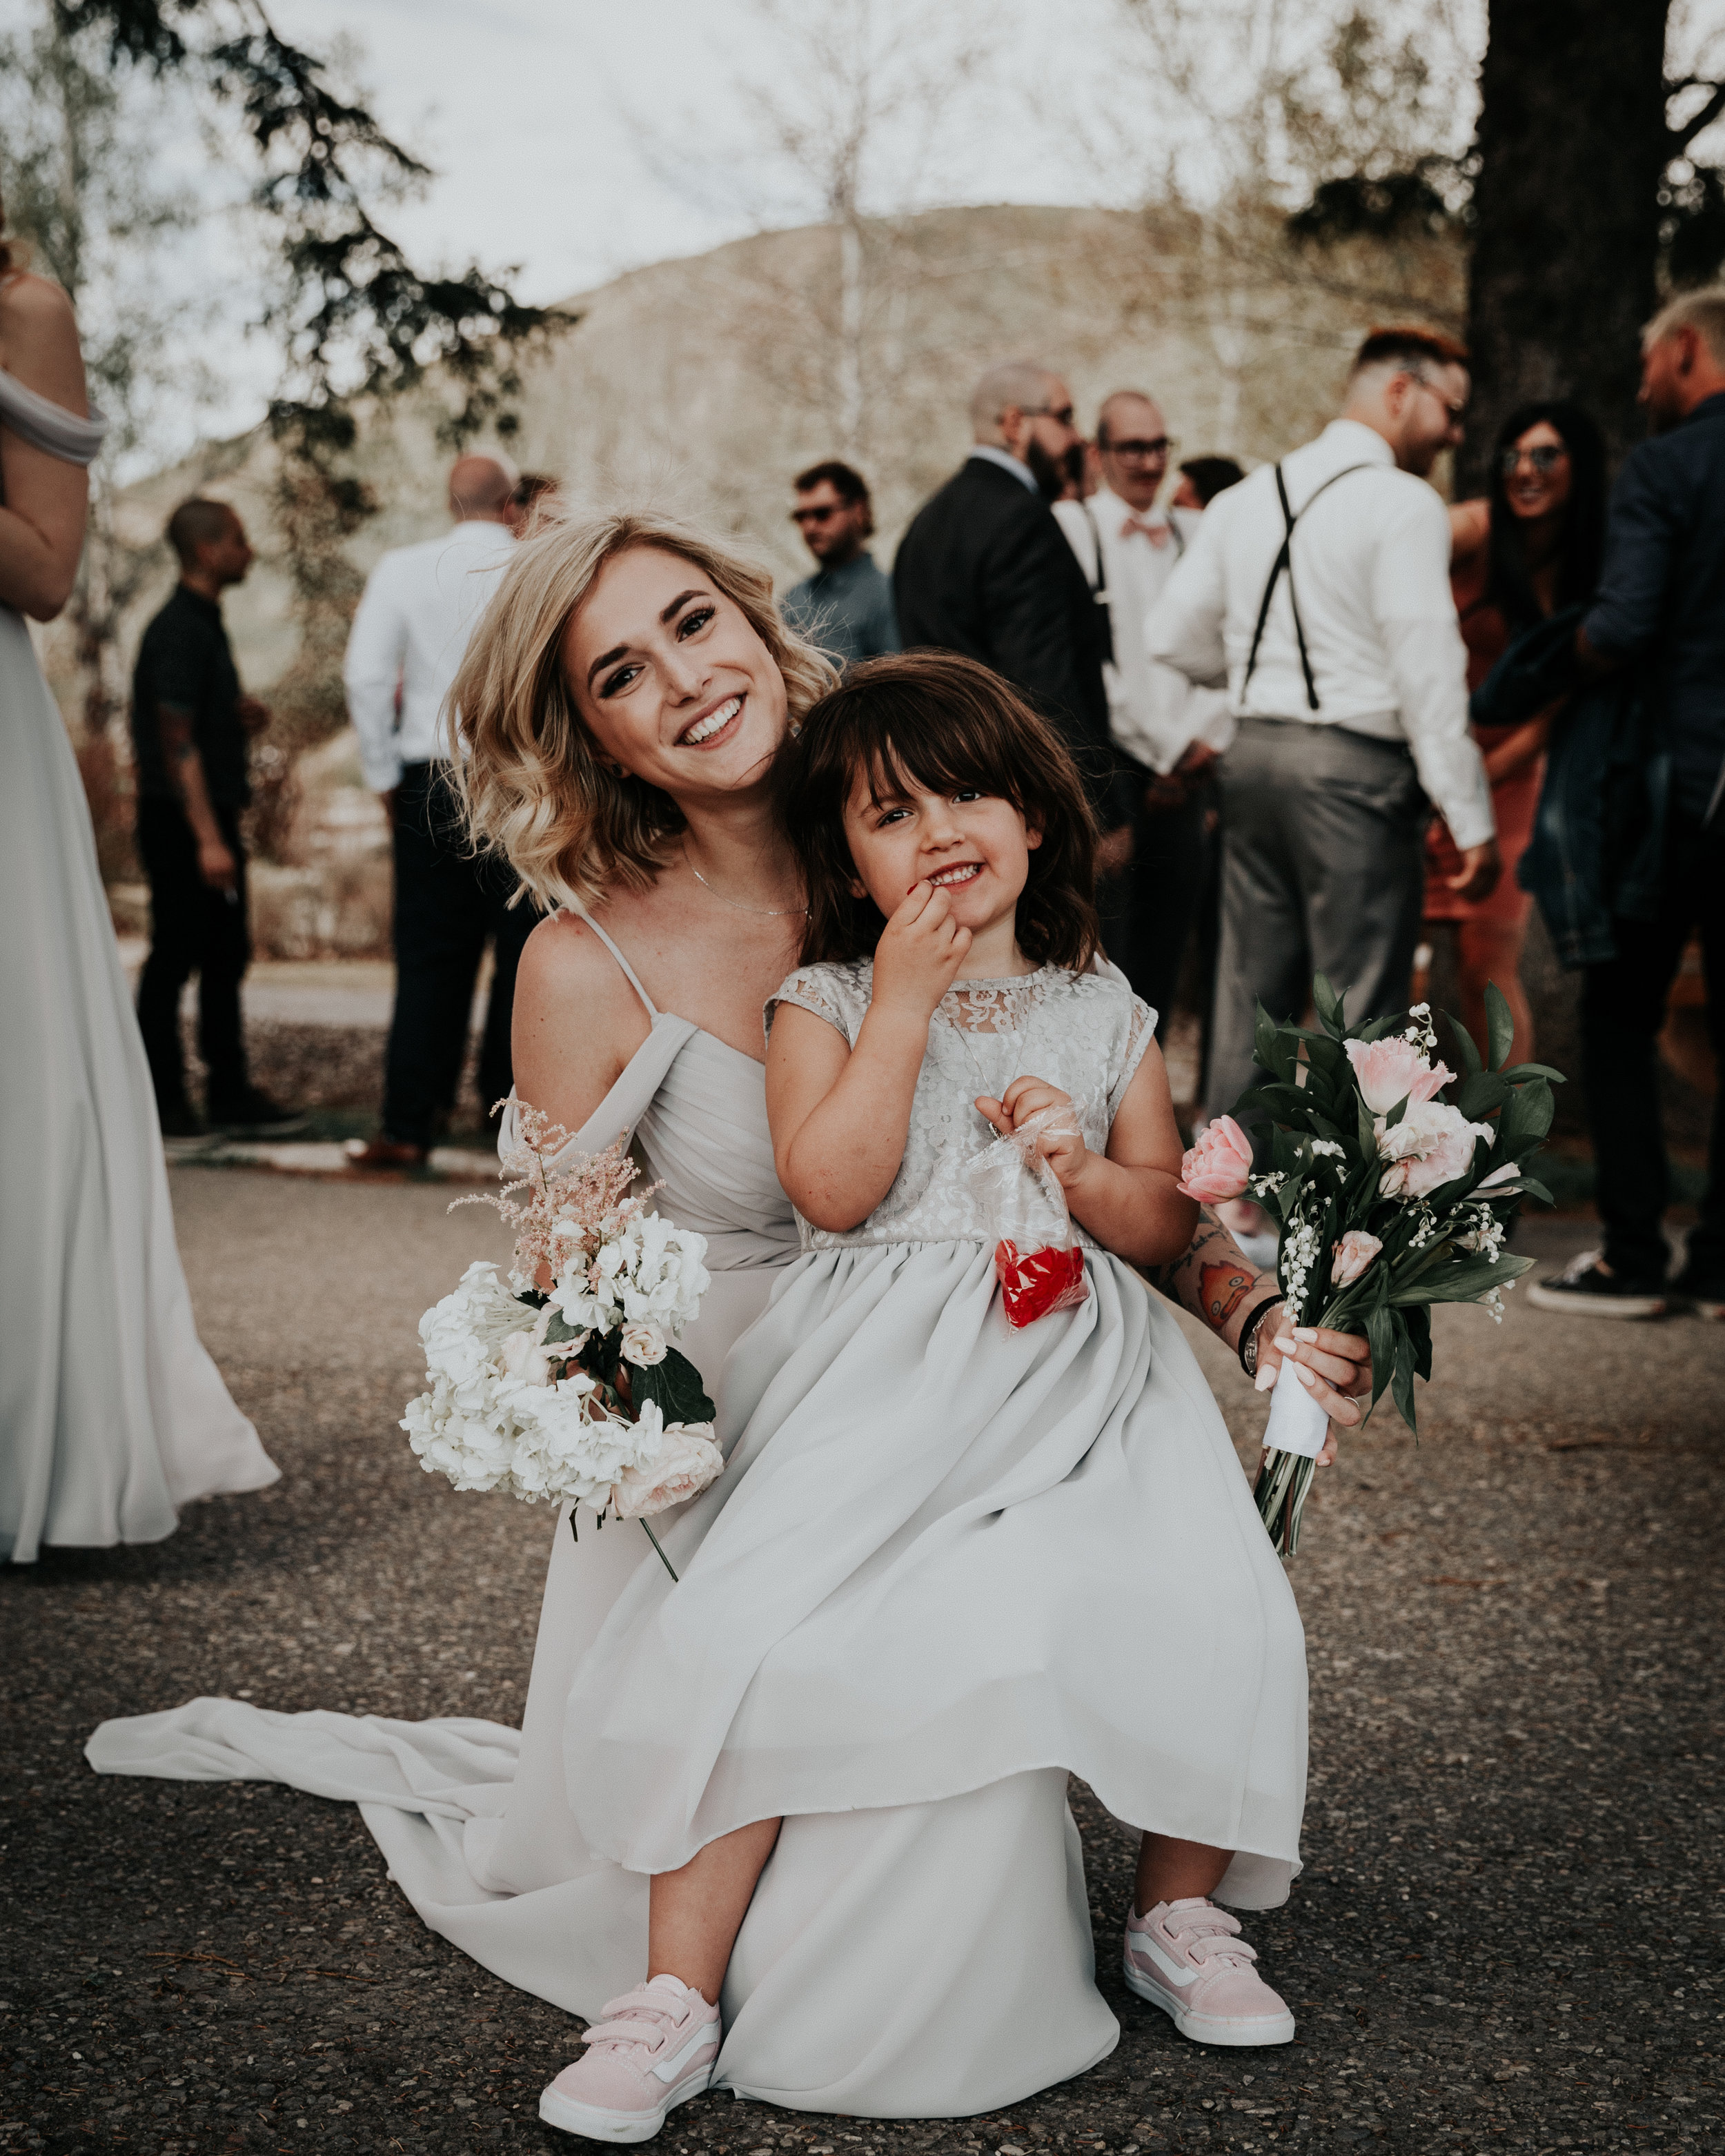 Walters Wedding Favourites - JayRMcDonald (1 of 18).JPG